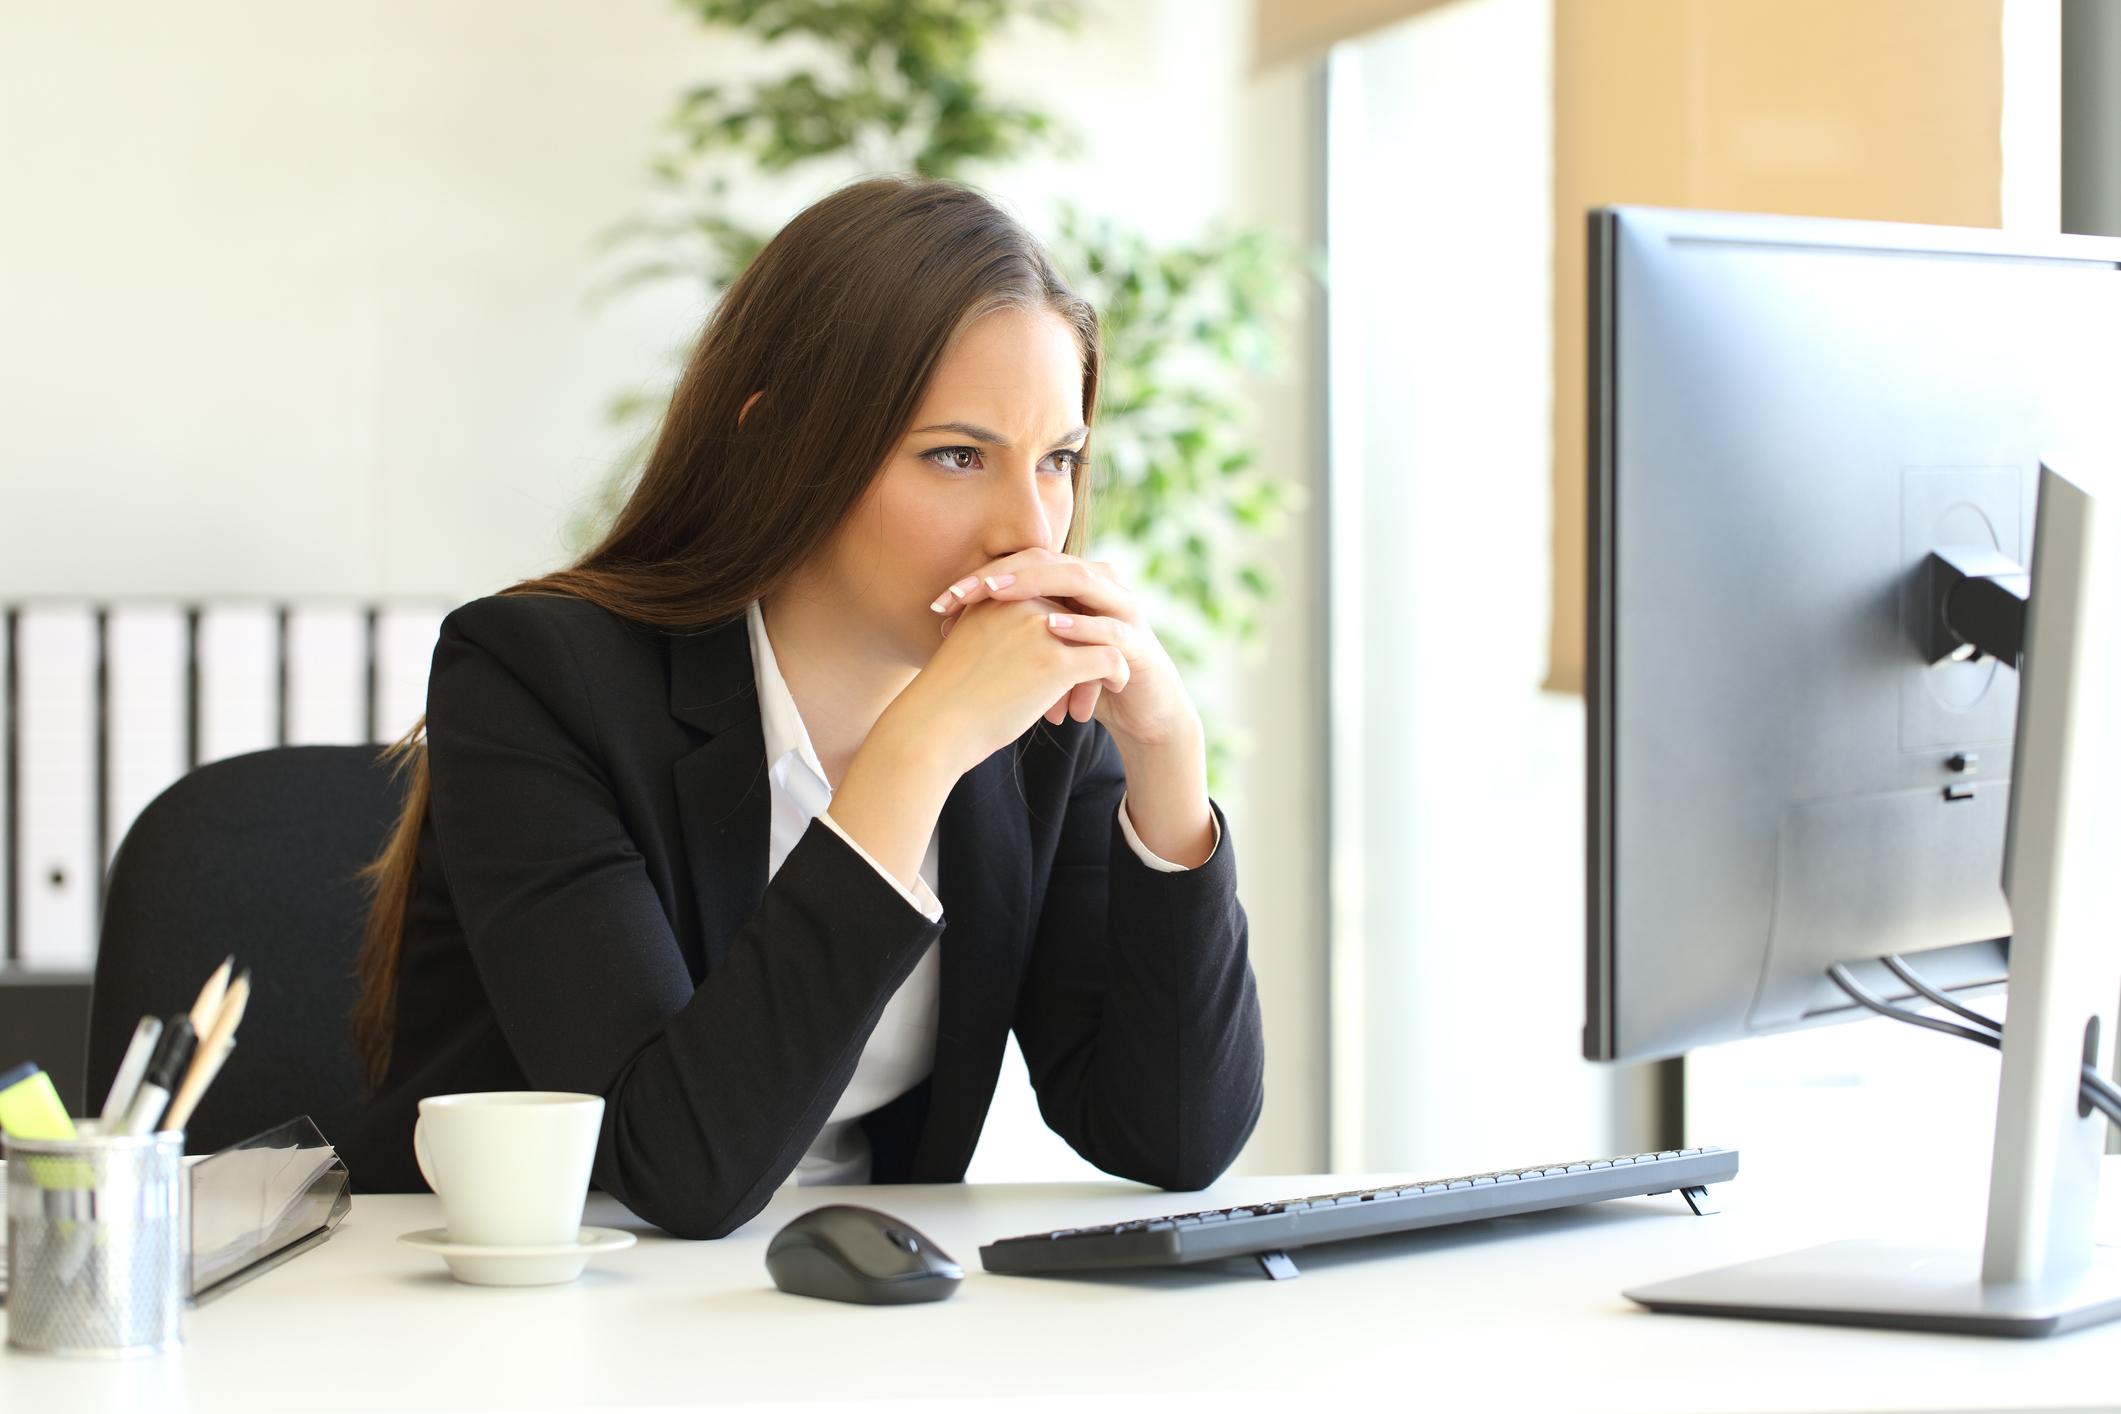 8 Project Management Underperformance Problems